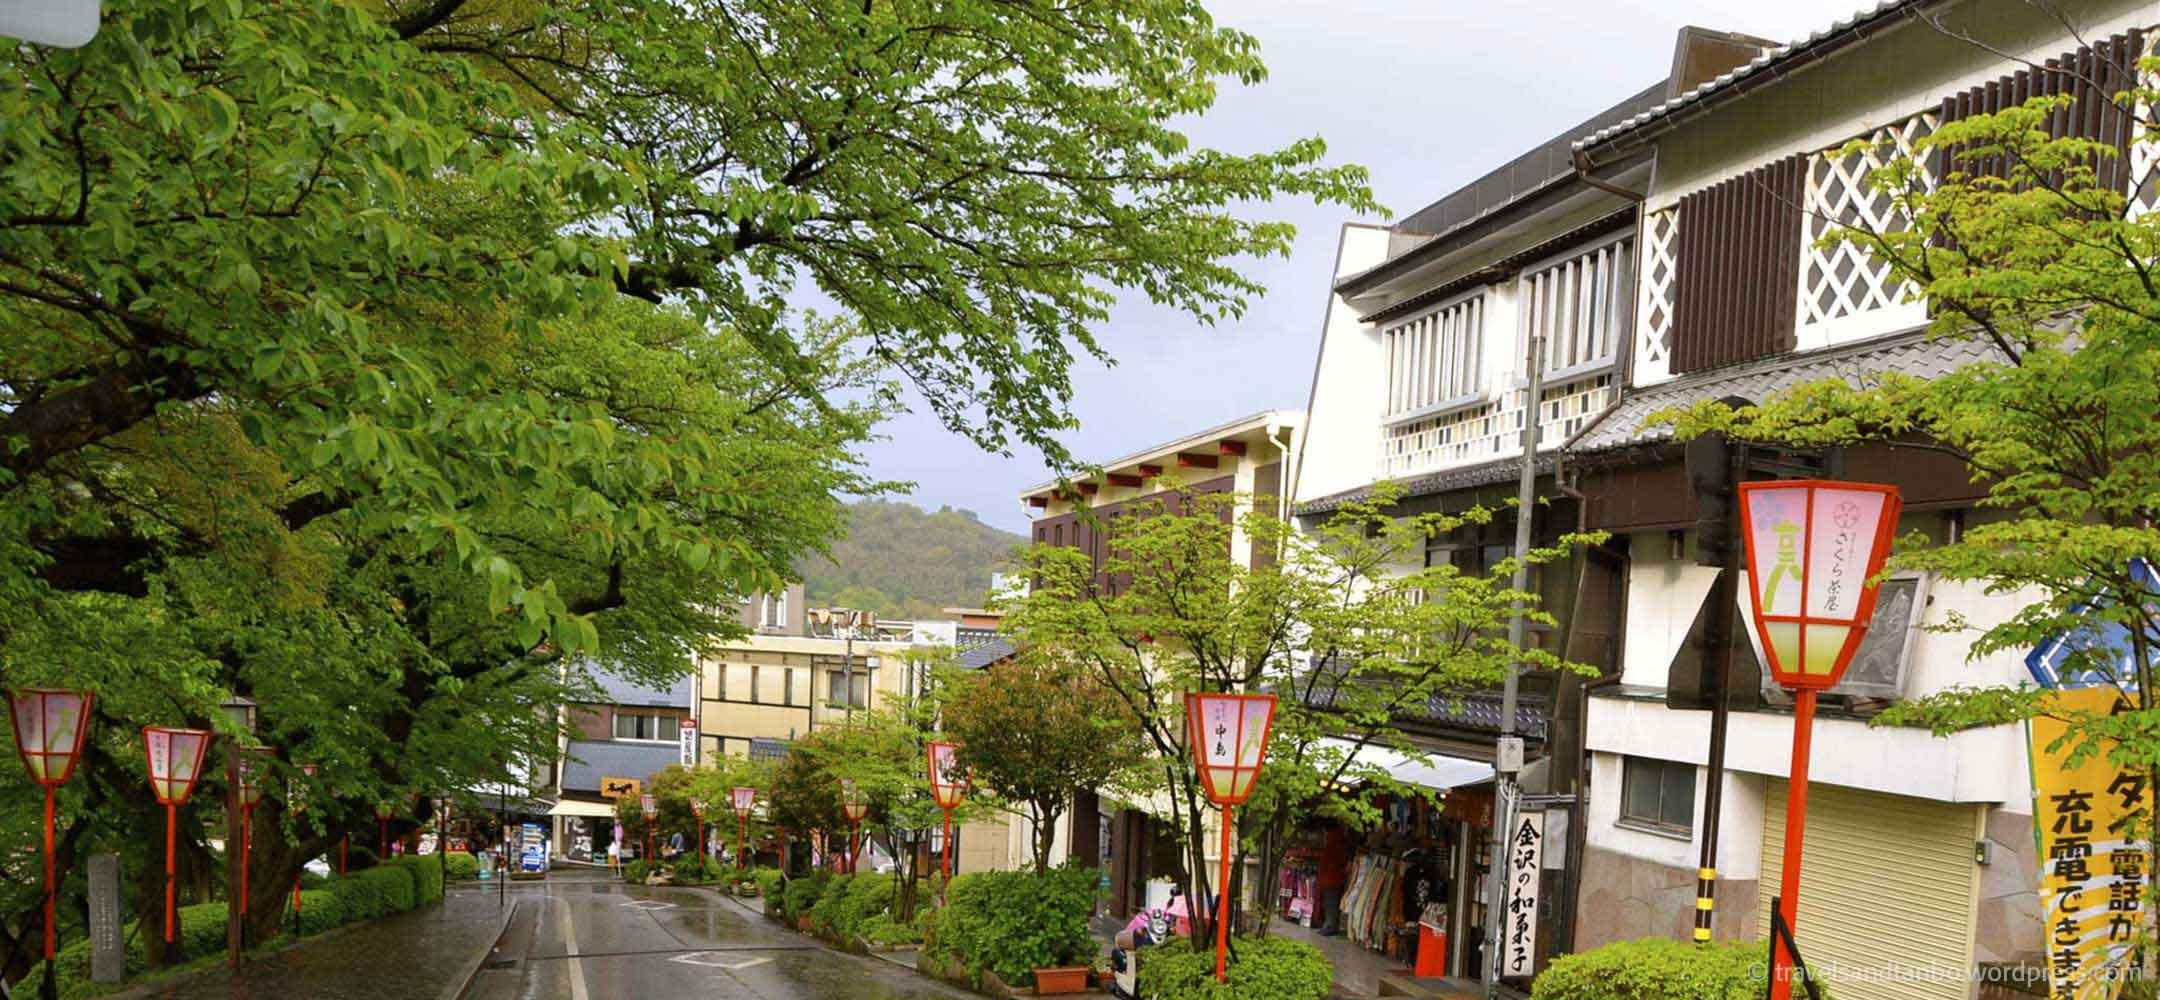 Noto Japan  city pictures gallery : Noto Peninsula, Chubu | Inside Japan Tours